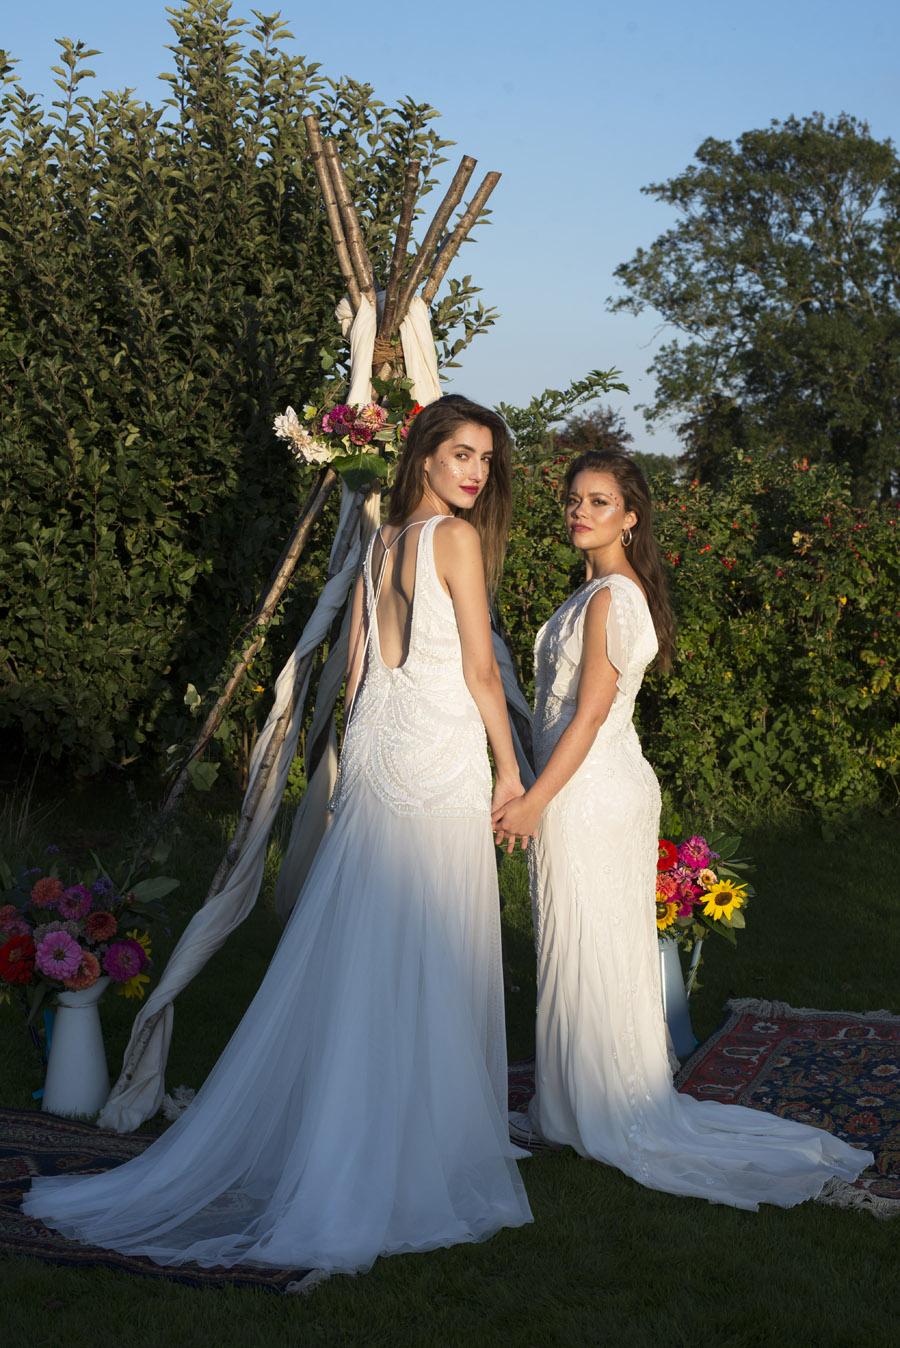 Same sex wedding styling boho chic festival inspiration - image credit Emma Hall Photography (31)